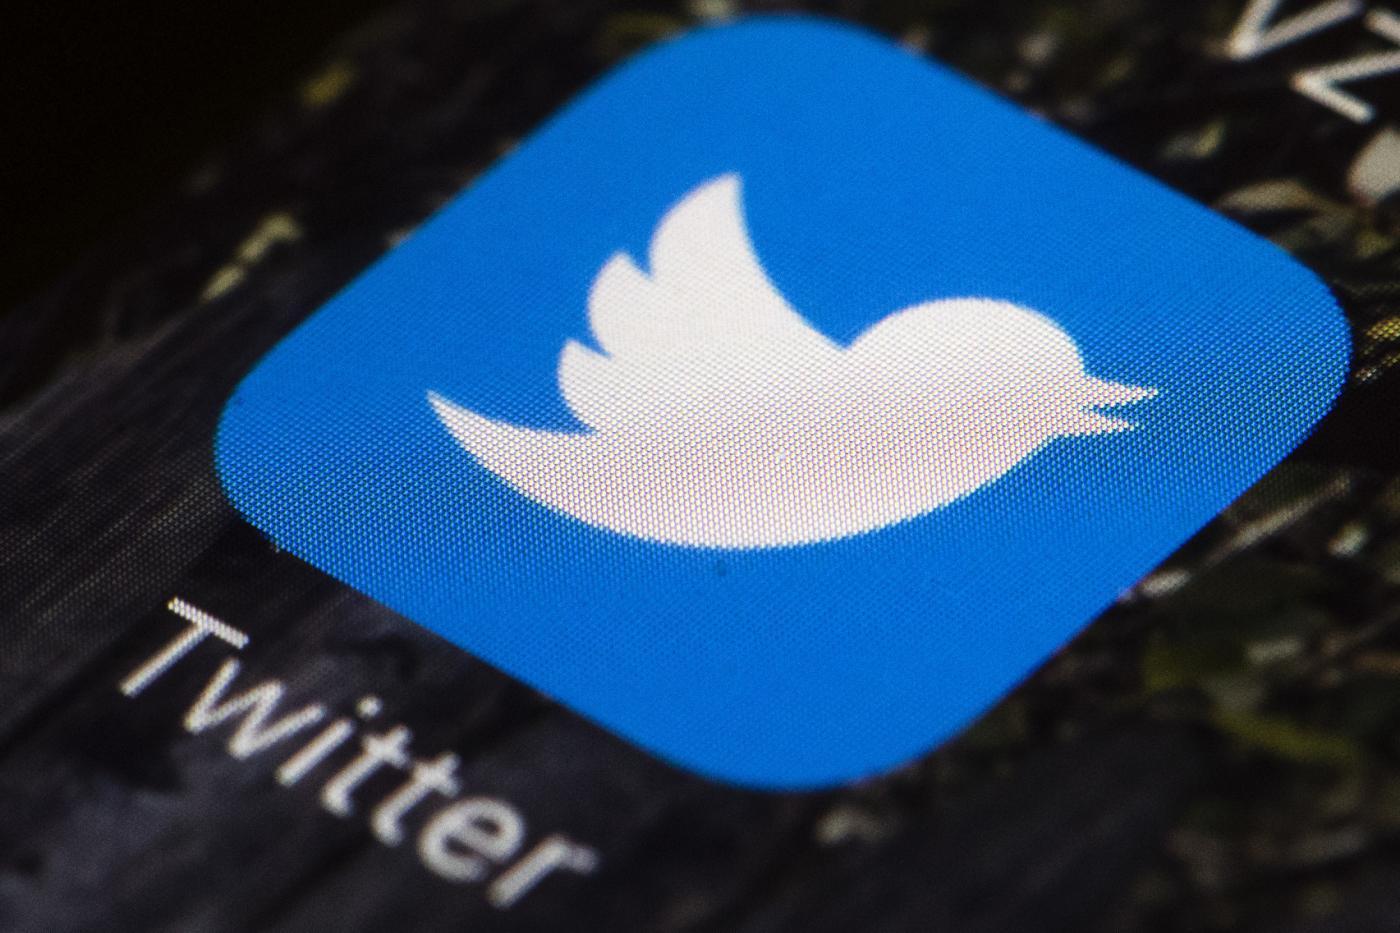 Twitter riprende Trump, lui attacca Twitter e Facebook dice la sua